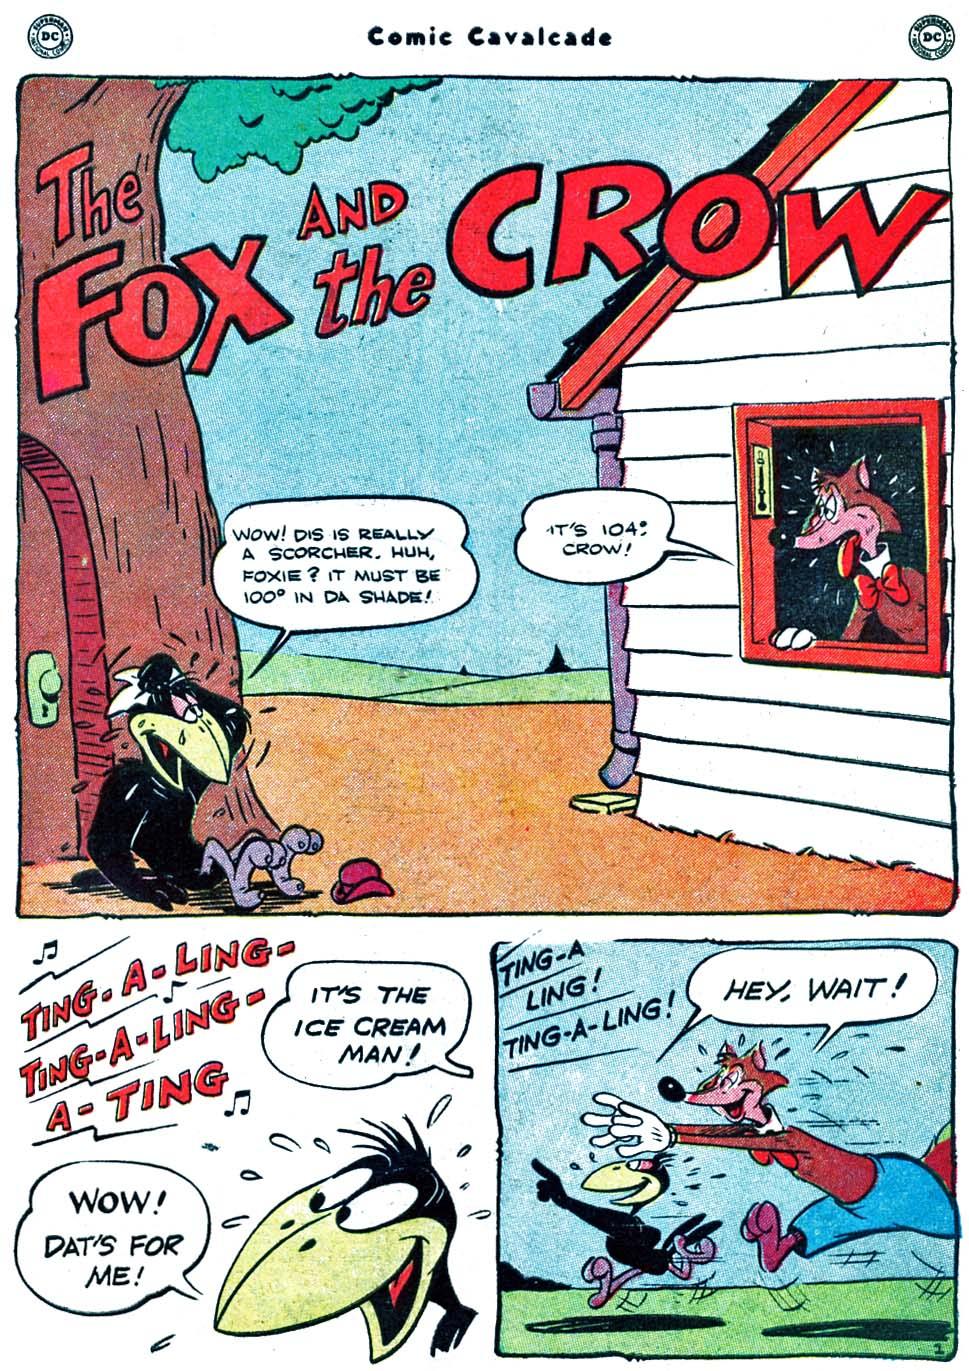 Comic Cavalcade issue 40 - Page 3